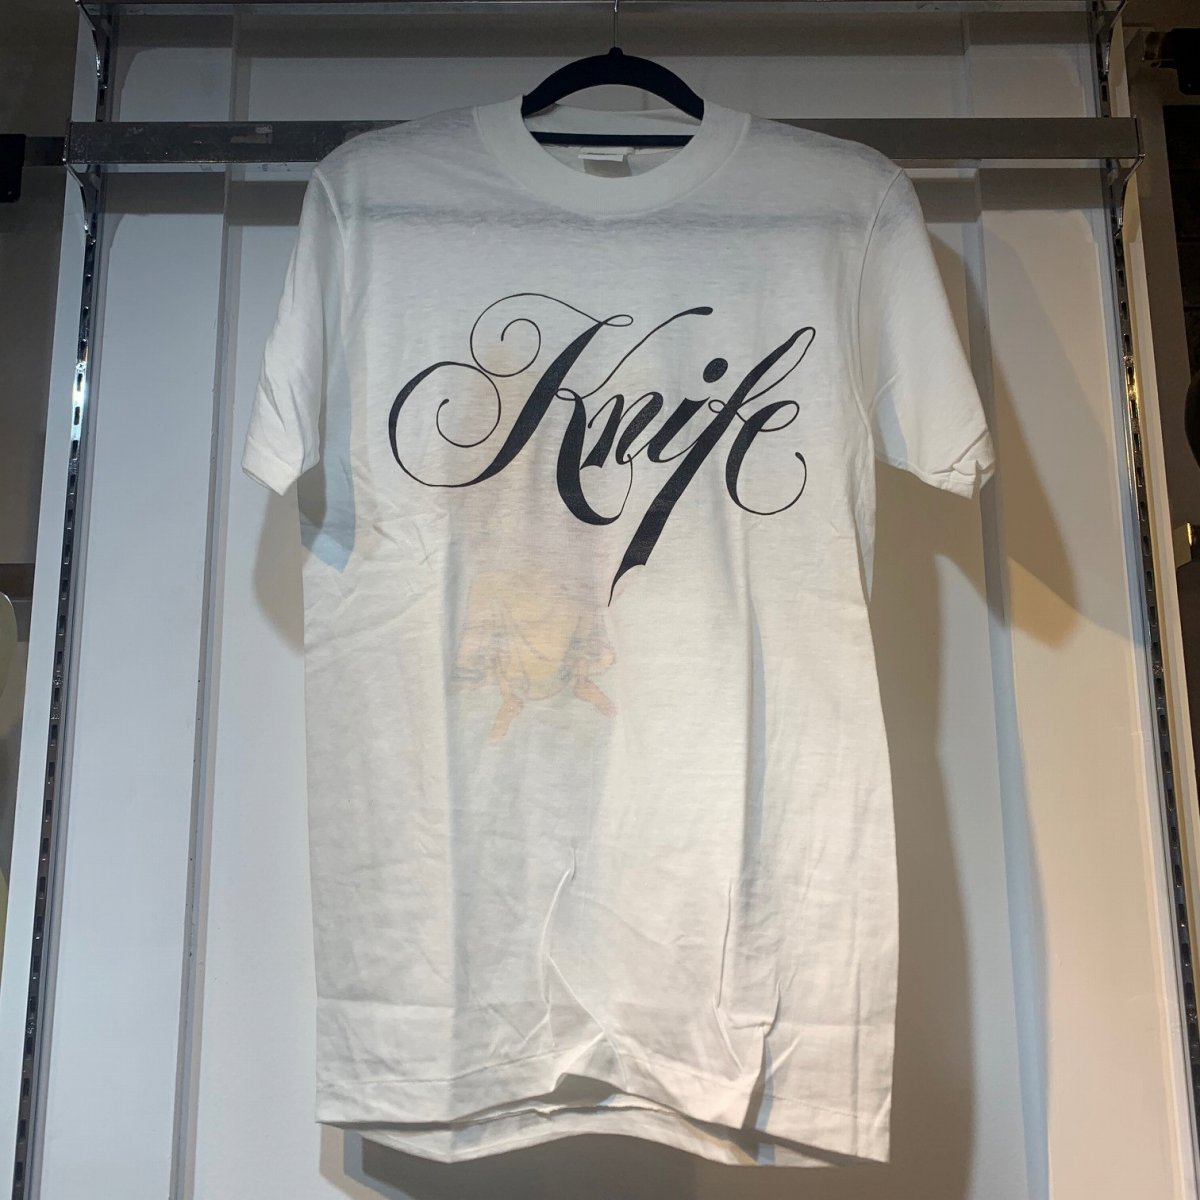 NO BRAND AZTEC CAMERA Tour 1984 Knife T-Shirt White 【御茶ノ水FINEST_GUITARS】